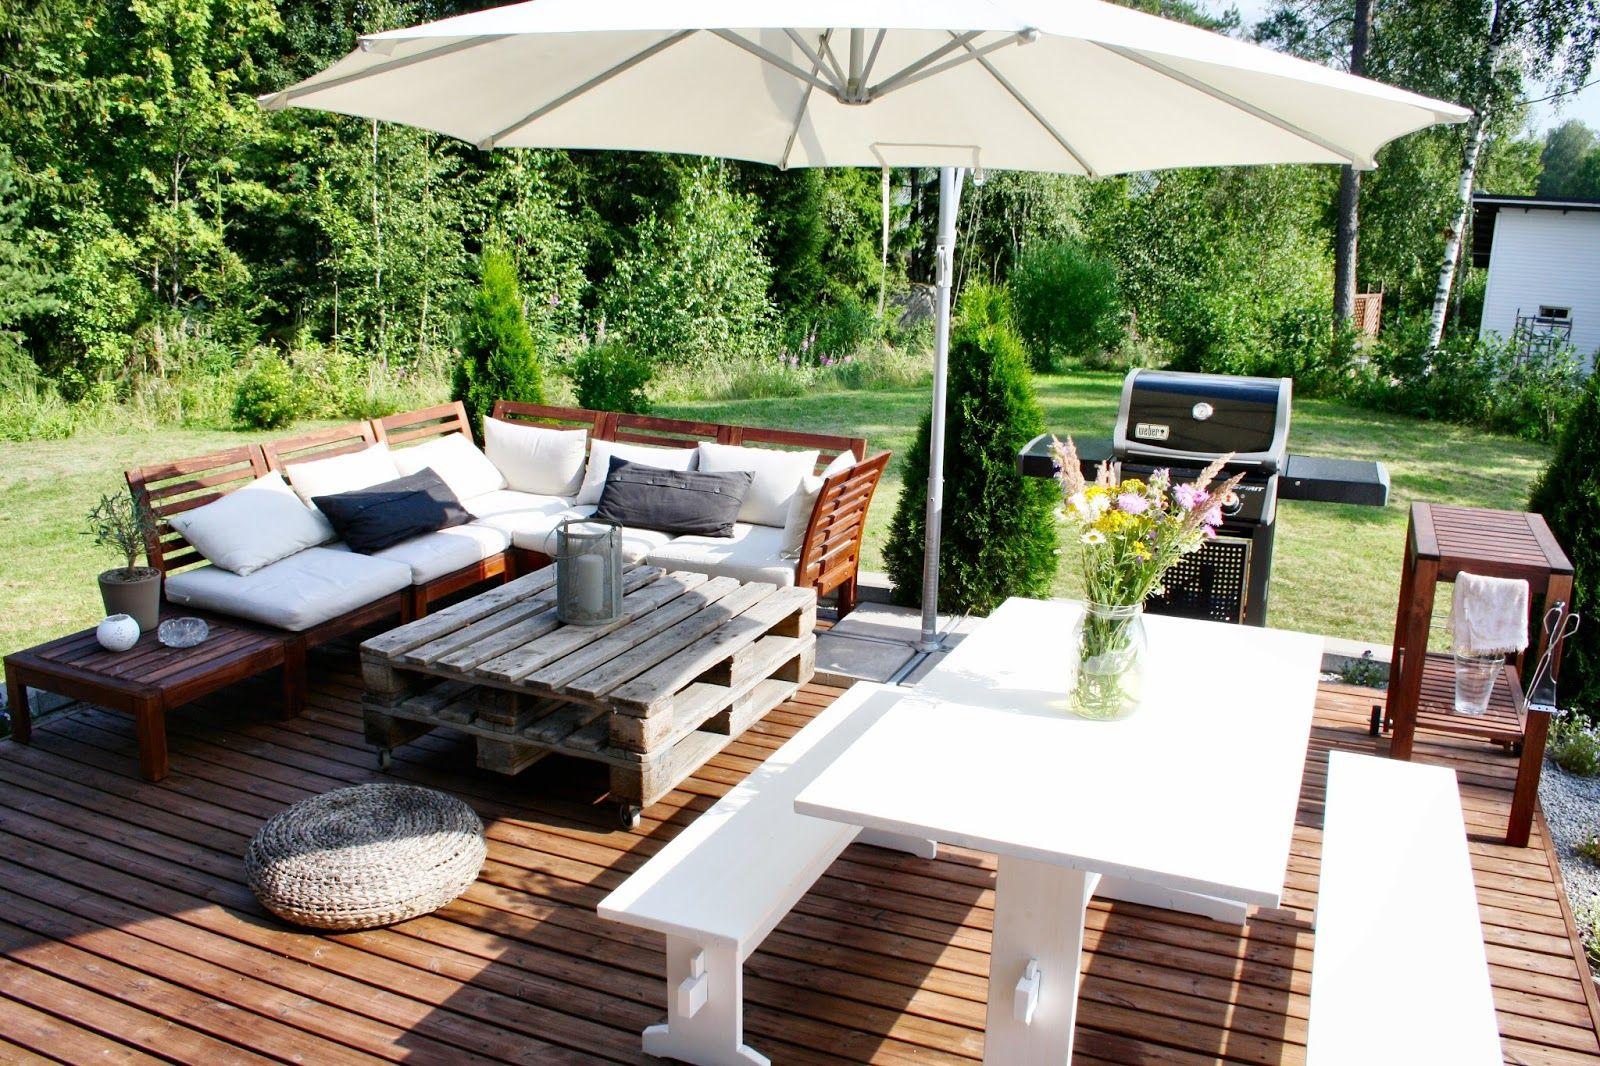 outdoor terrace patio garden ikea pplar kuormalava pirttip yt idahhh. Black Bedroom Furniture Sets. Home Design Ideas